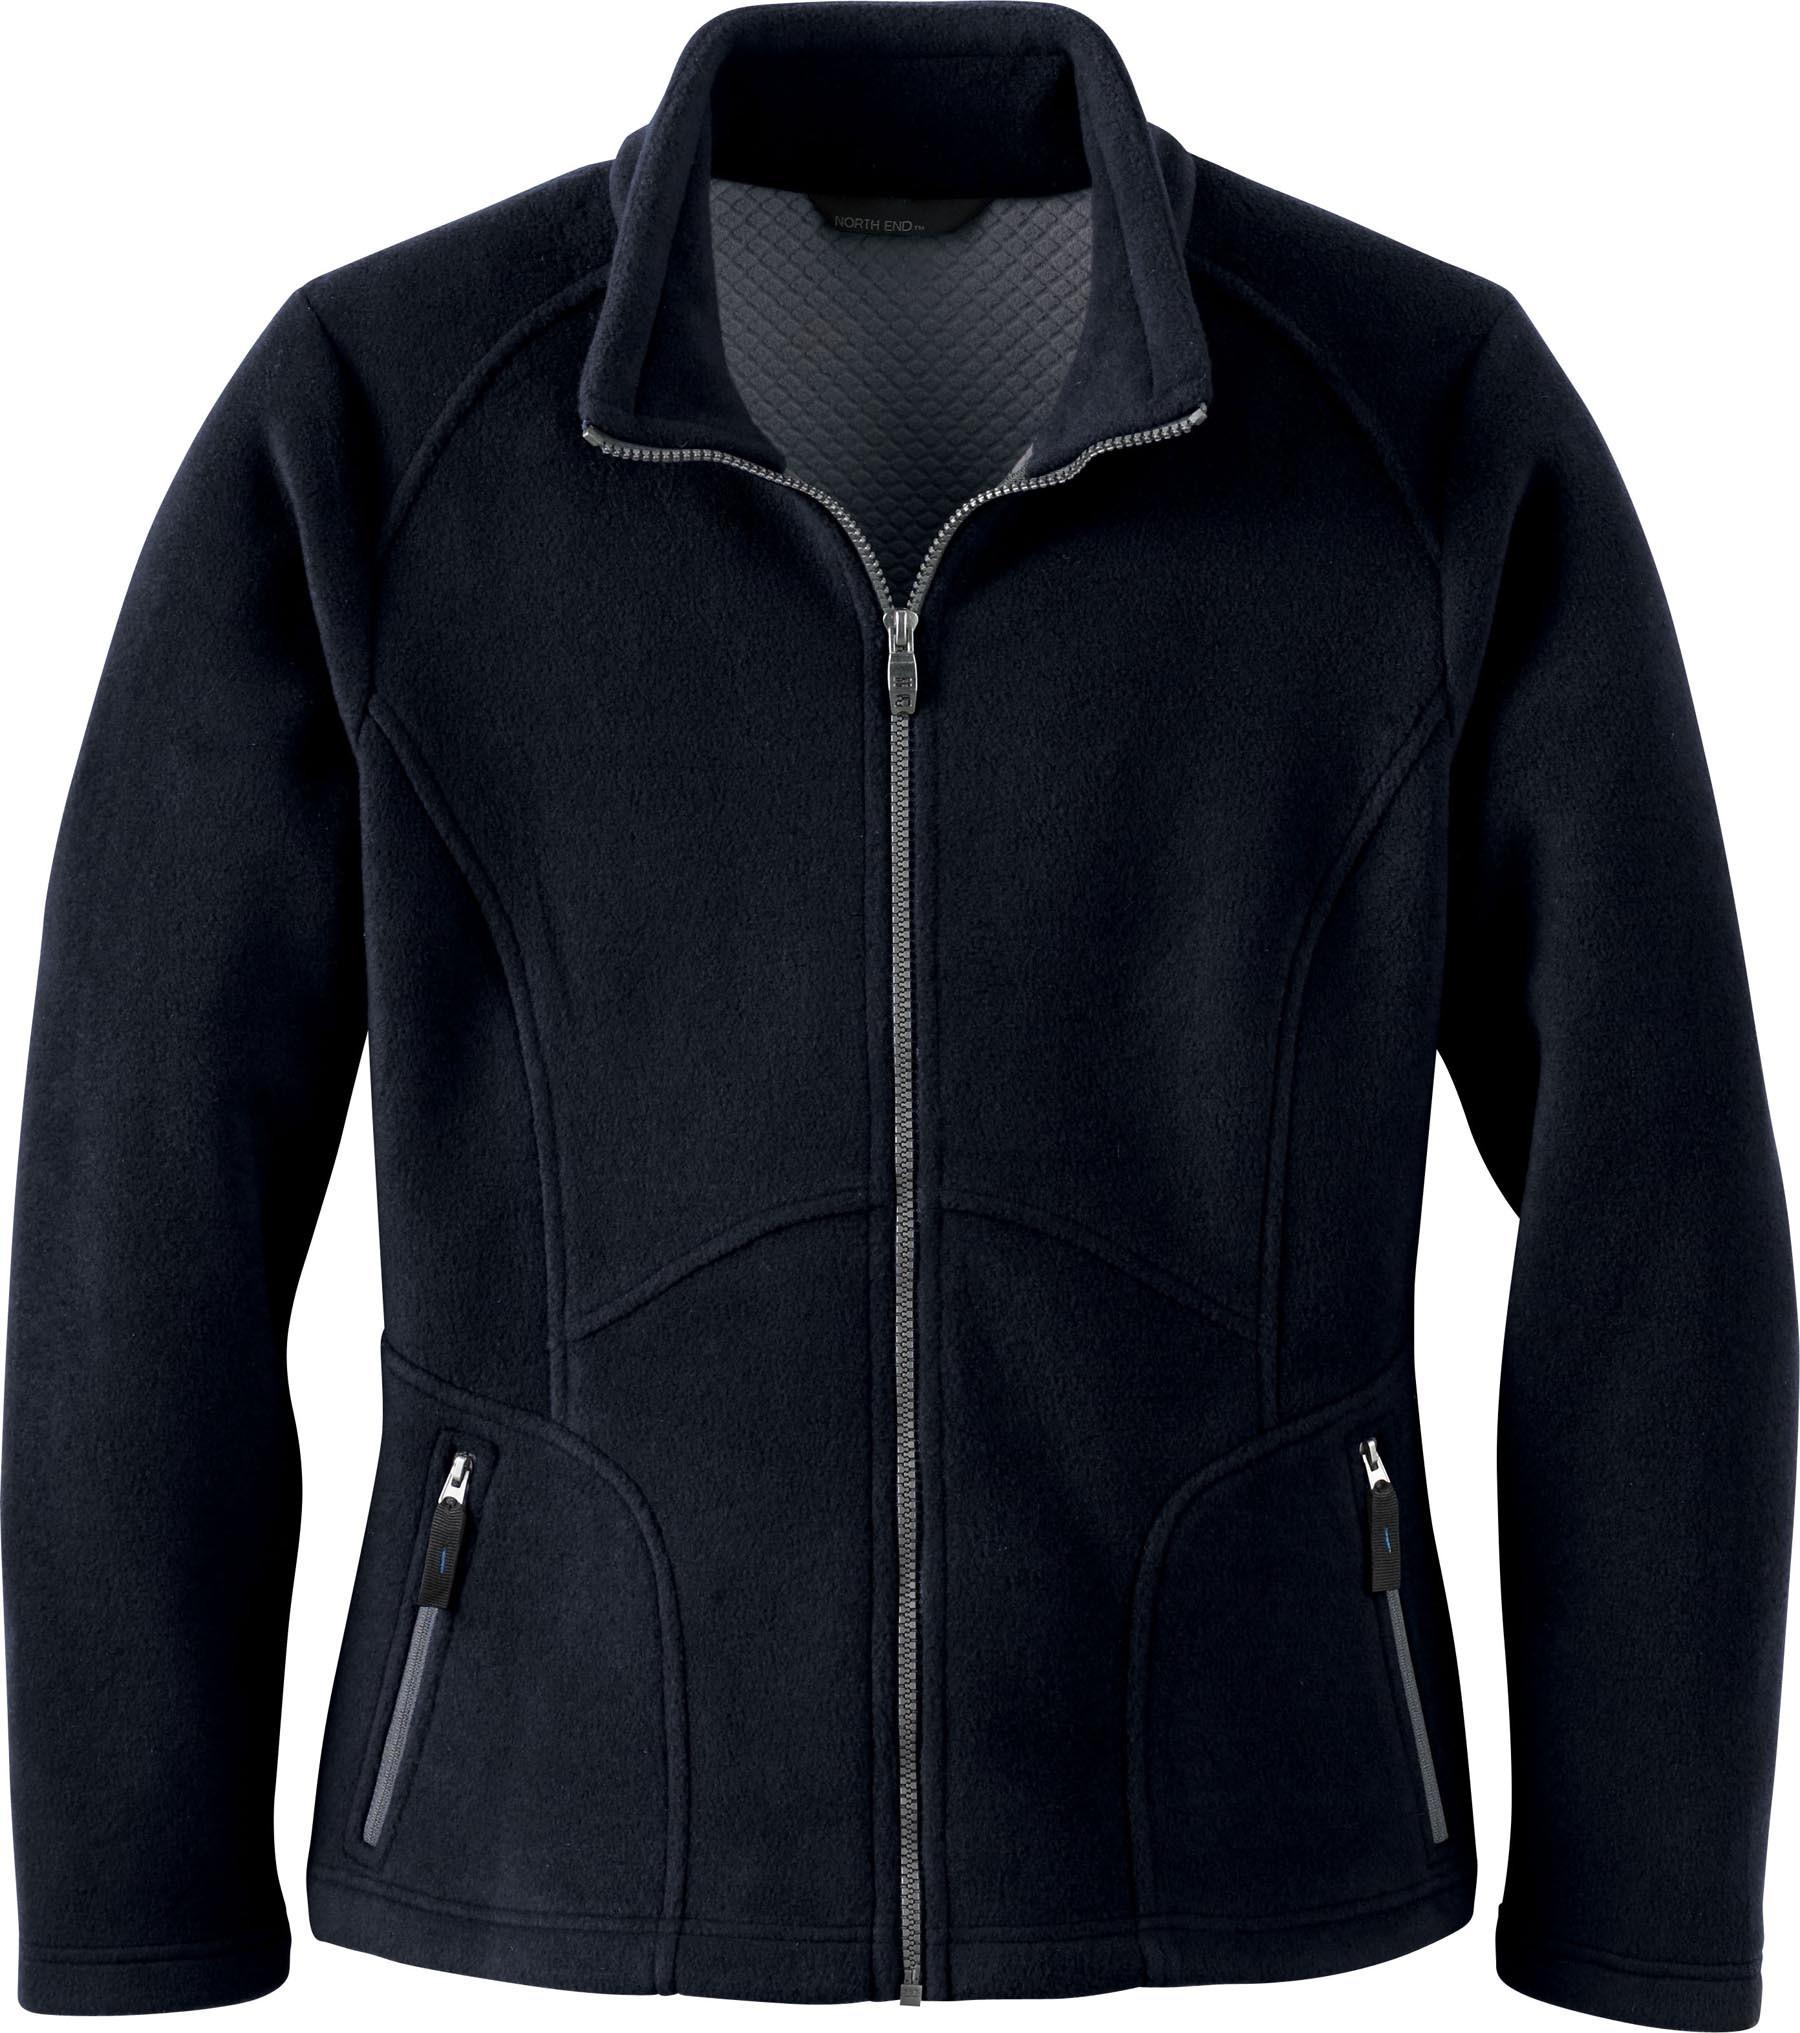 Ash City Bonded Fleece 78078 - Ladies' Bonded Jacquard ...